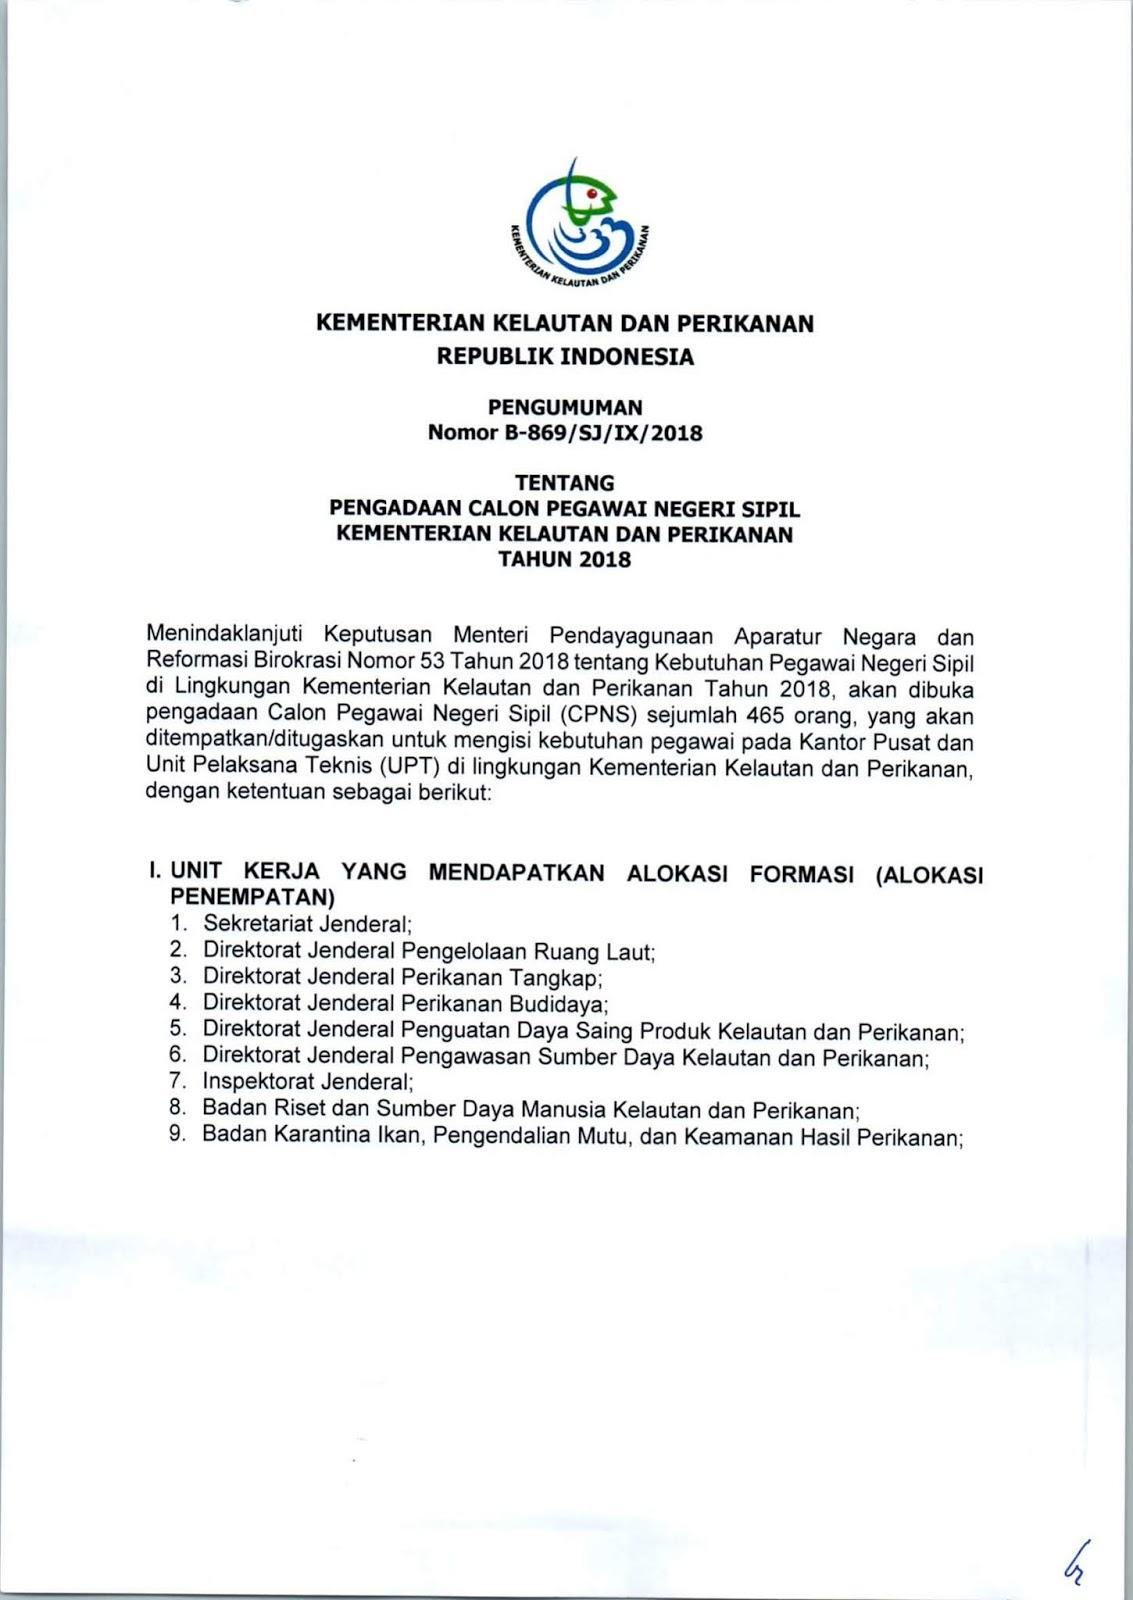 Lowongan Kerja   CPNS Kementerian Kelautan dan Perikanan   [465 Formasi]  Oktober 2018